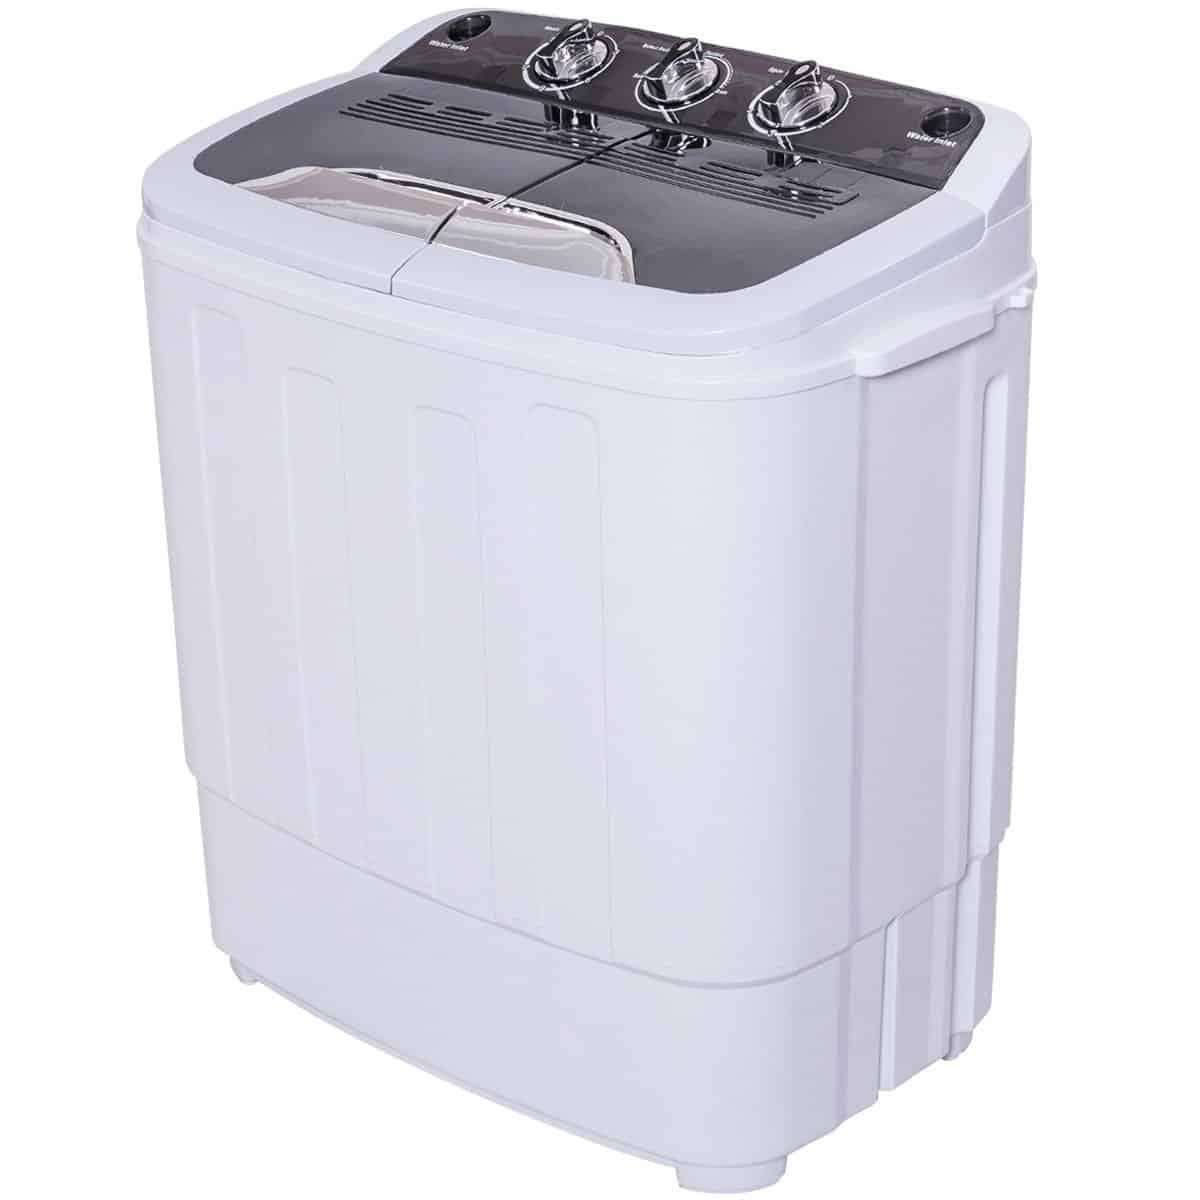 Giantex portable compact 13 lbs. mini twin tub washing machine washer